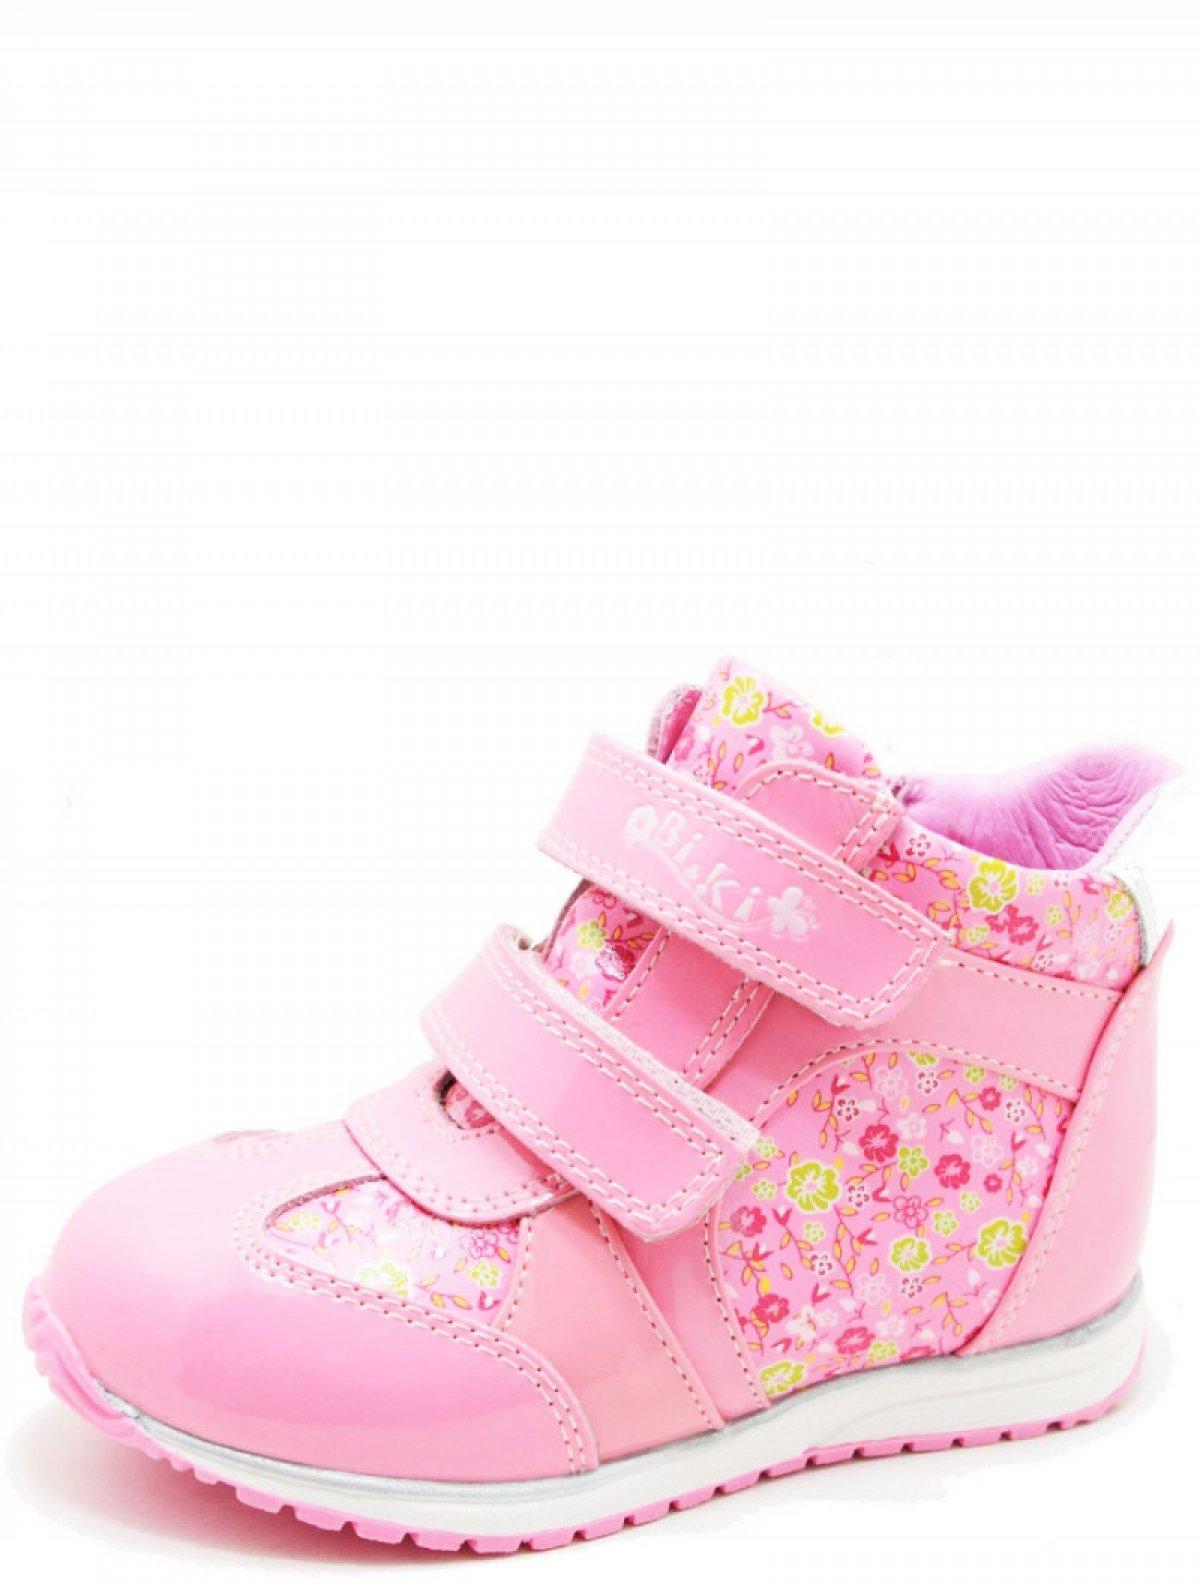 BI&KI A-B03-09-B ботинки для девочки